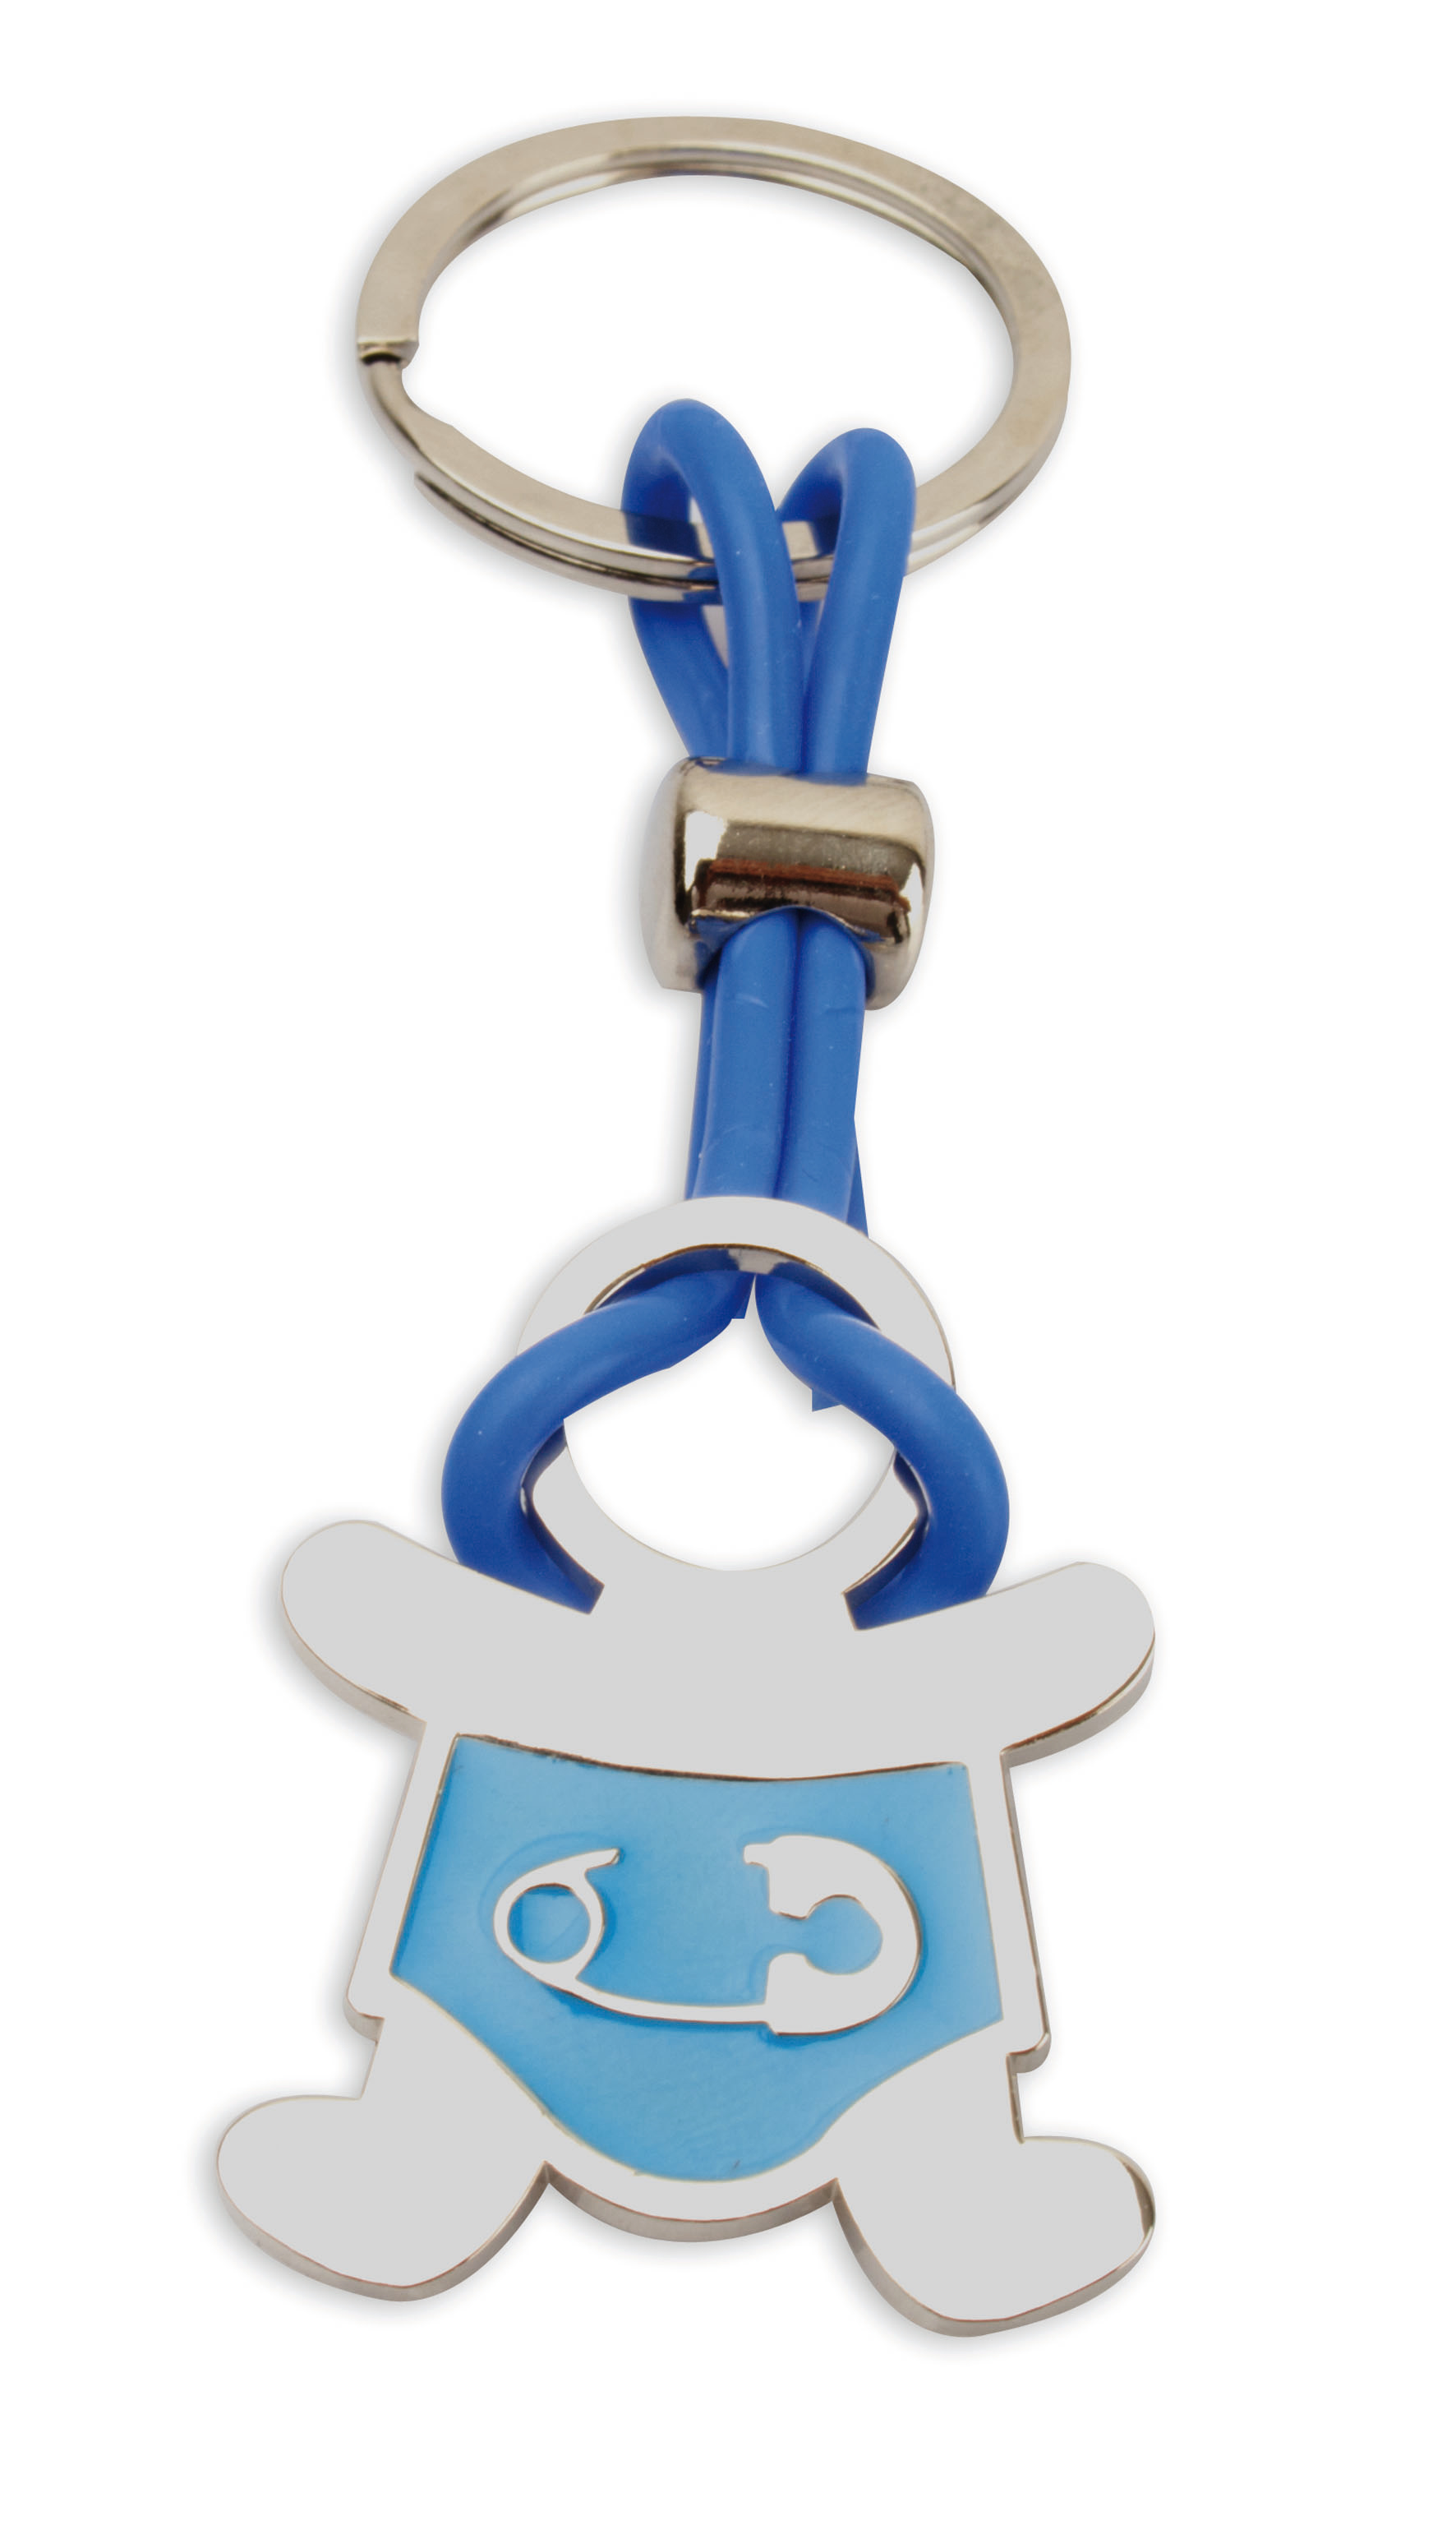 Porta chaves 6